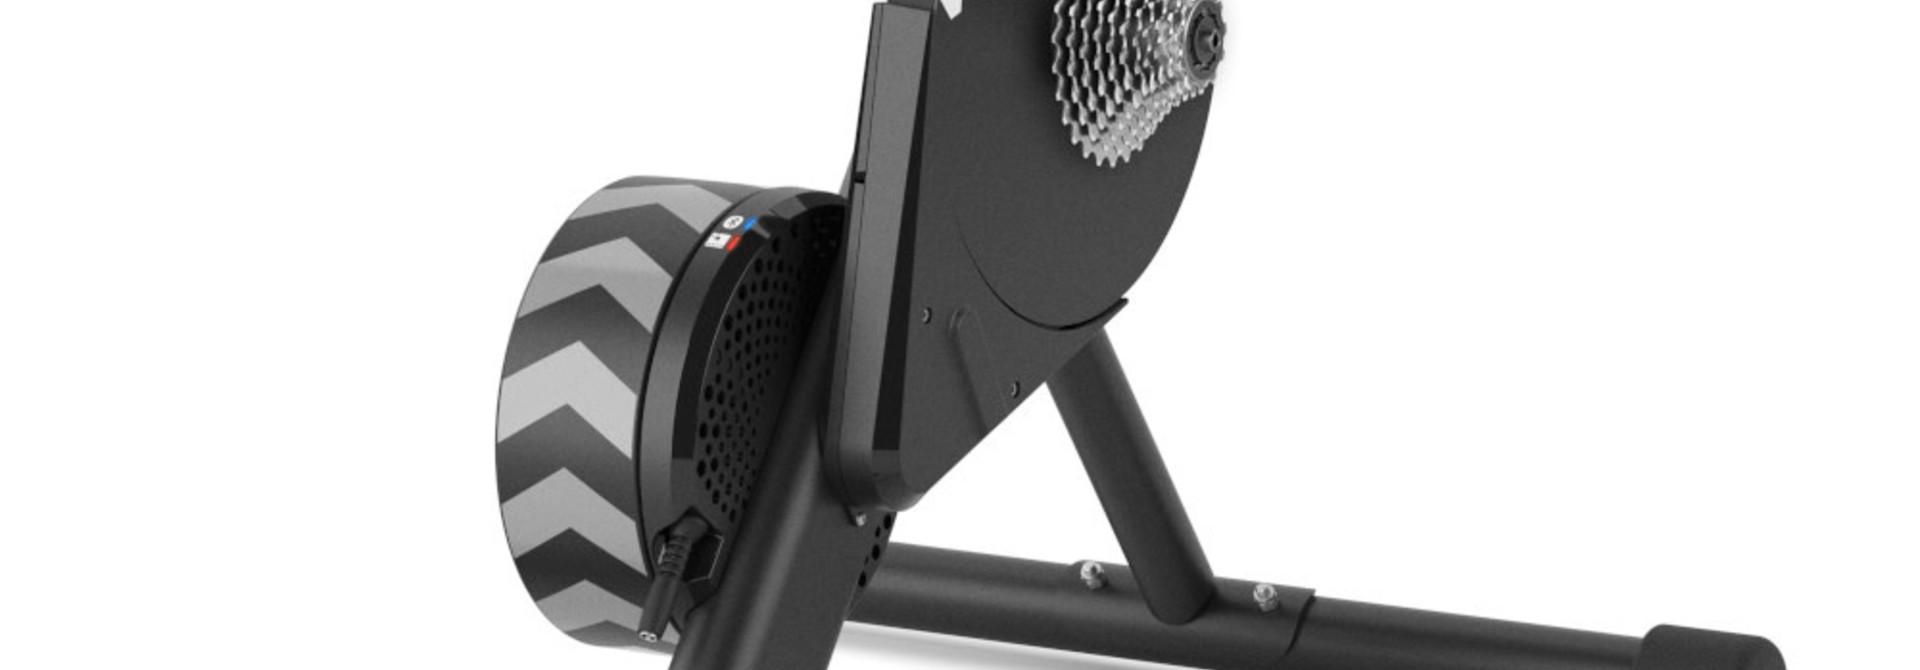 Kickr Core Direct-Drive Smart Trainer - Backorder